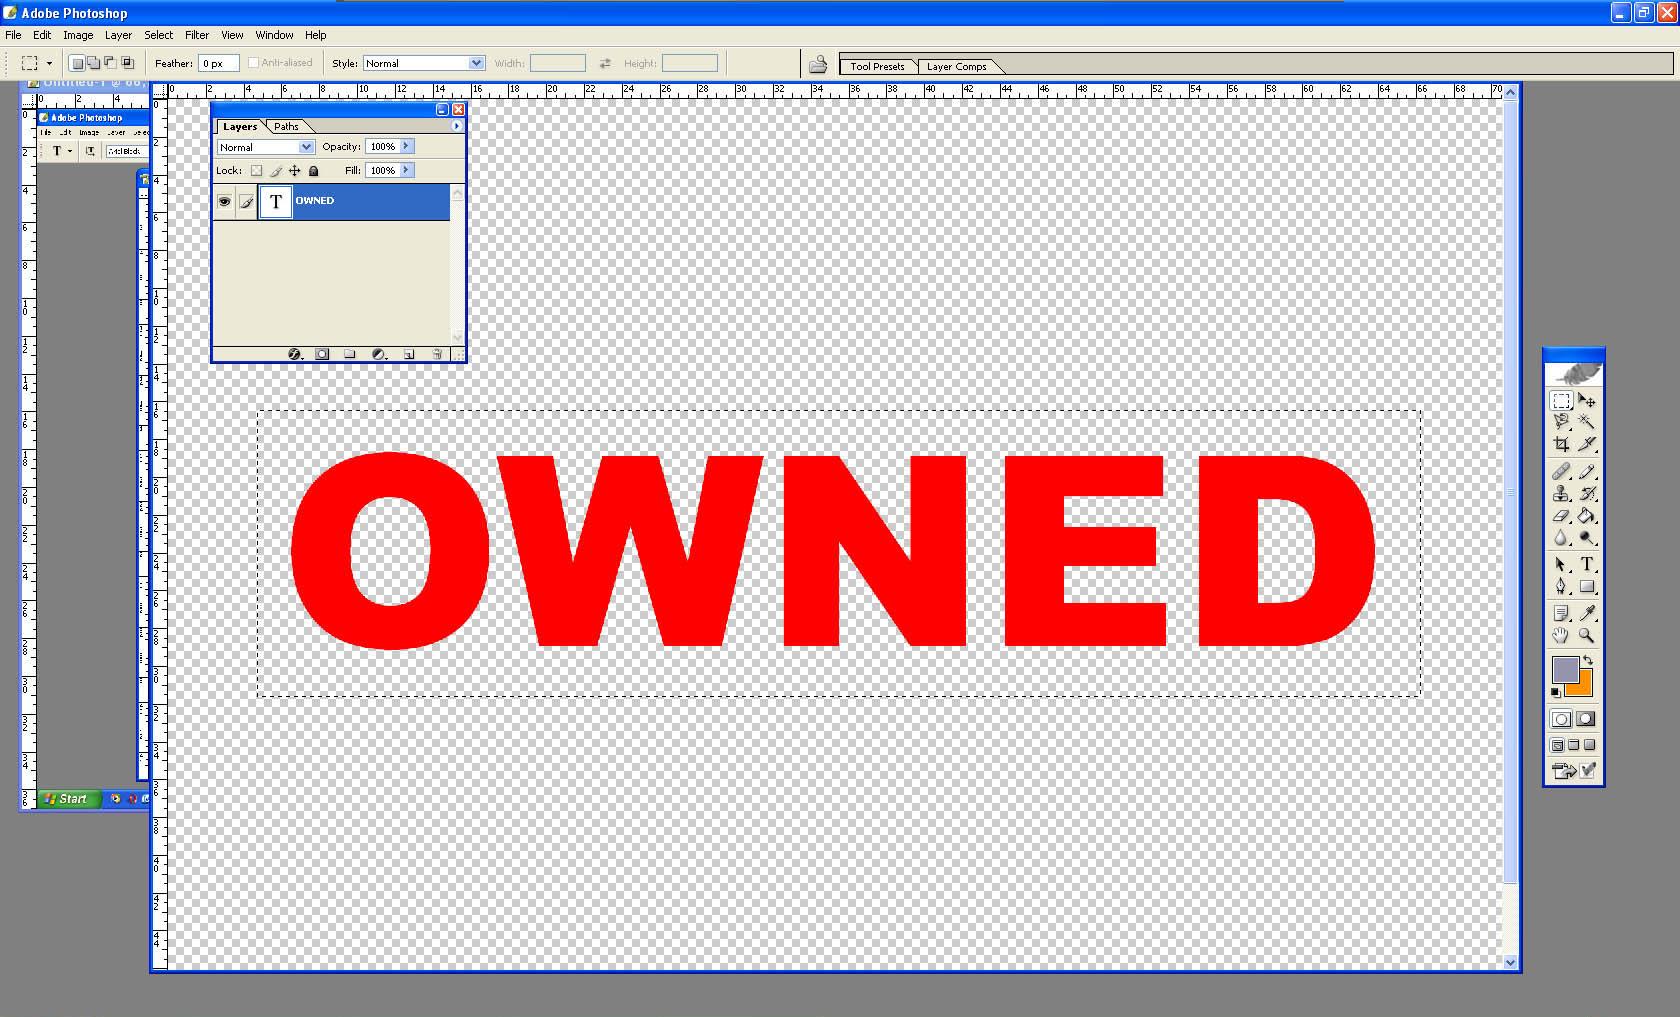 owned_part_2.jpg